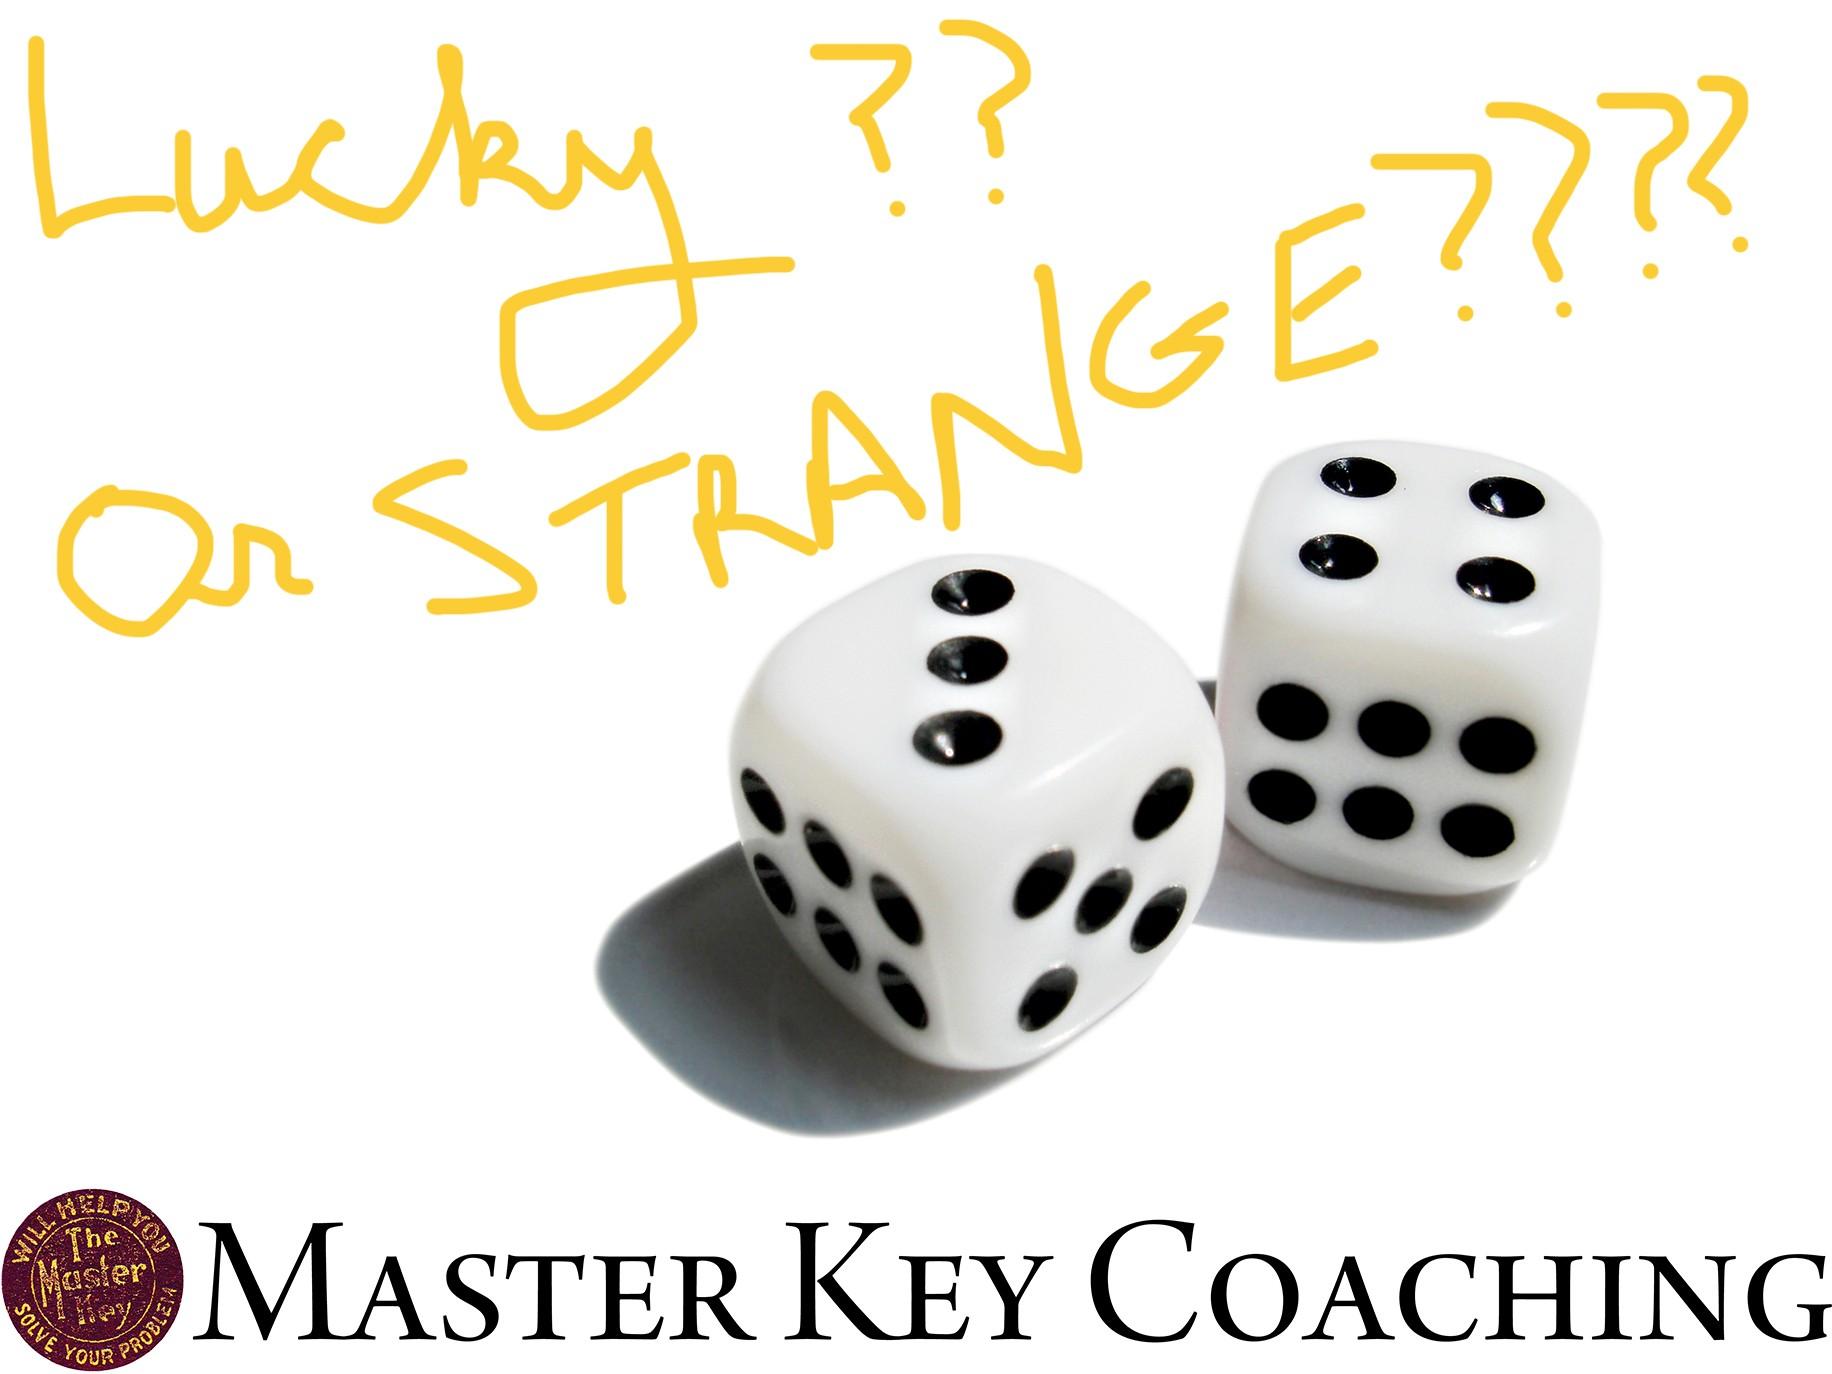 Charles F. Haanel's Strange Letter of Transmittal (masterkeycoaching.com)